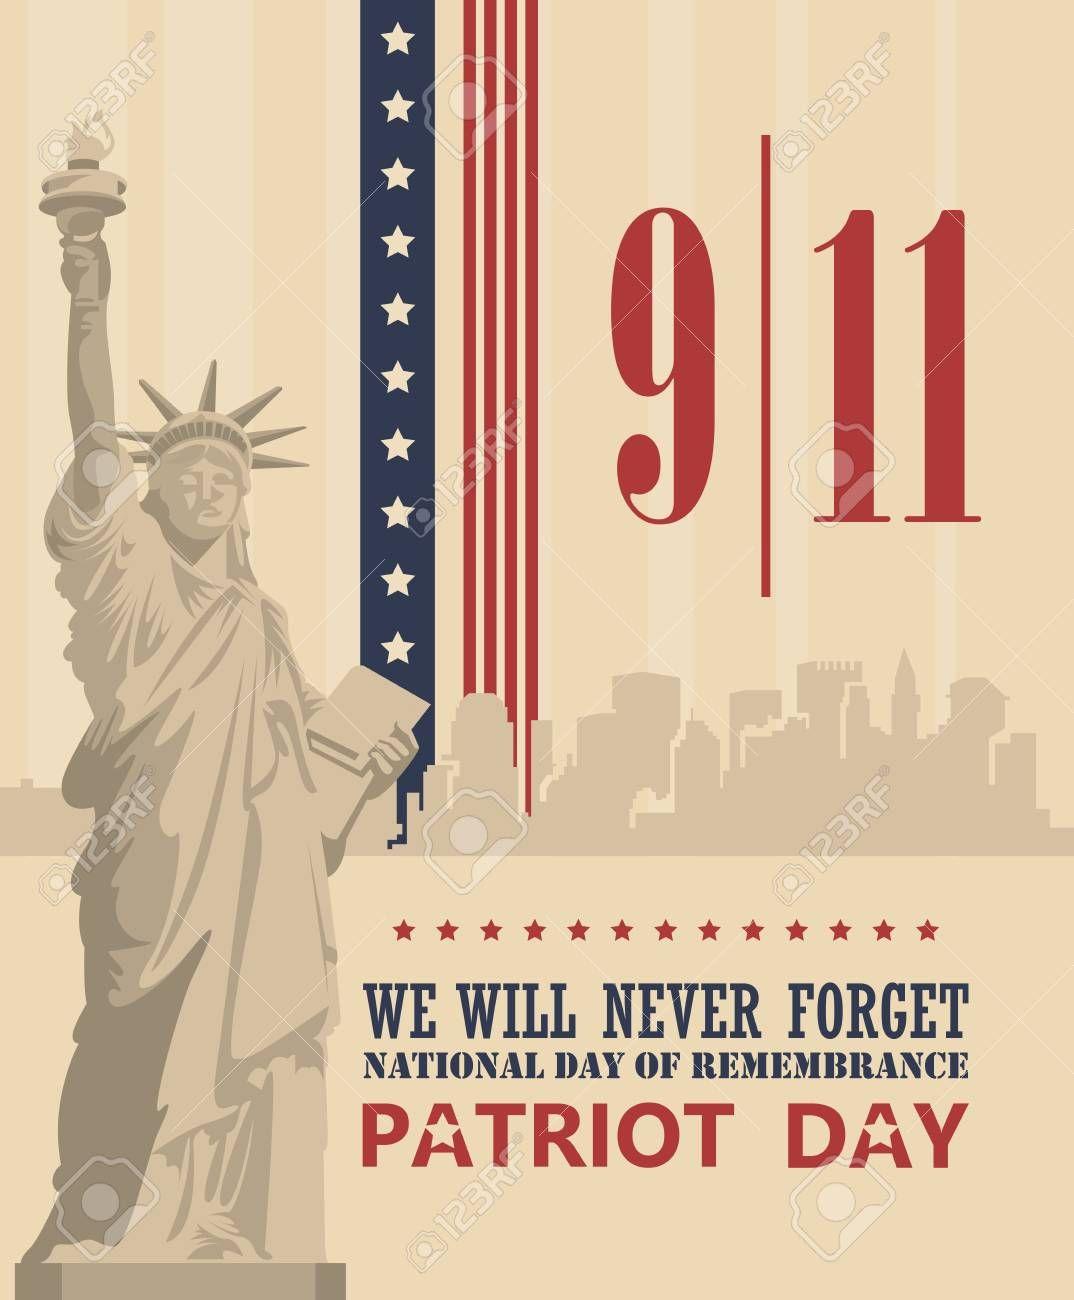 Patriot Day Vector Poster September 11 9 11 Spon Vector Day Patriot Poster September Remembrance Day Remembrance Poster